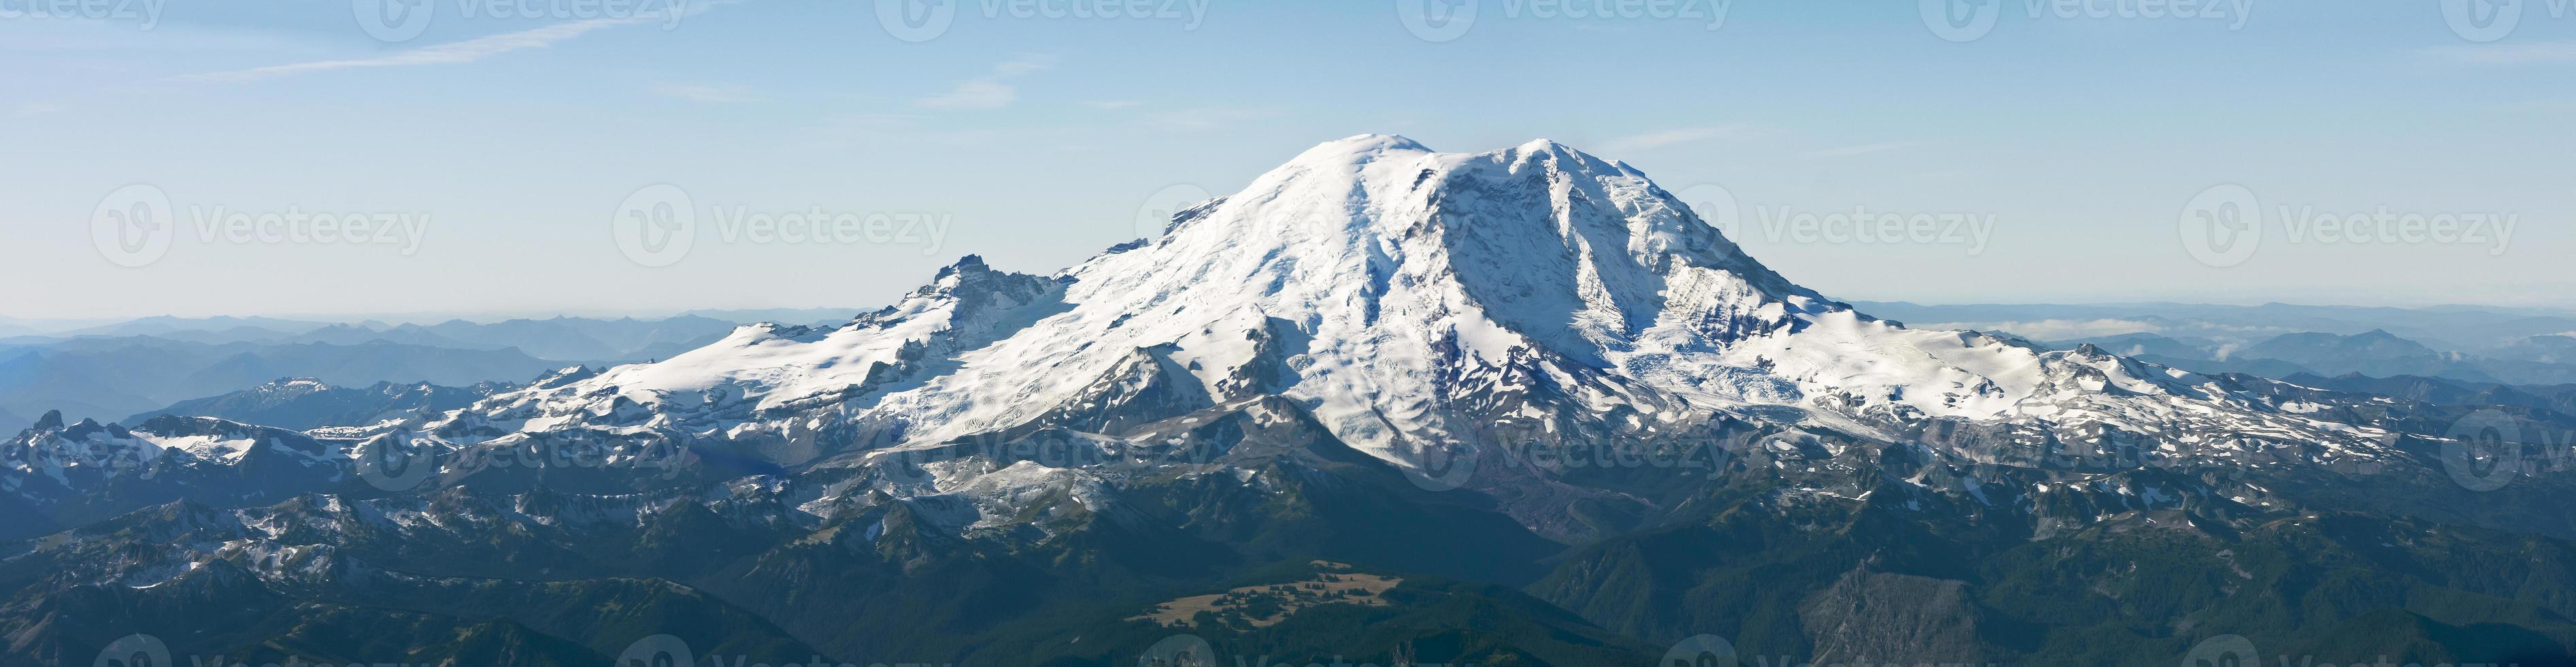 panoramautsikt över regnigare foto